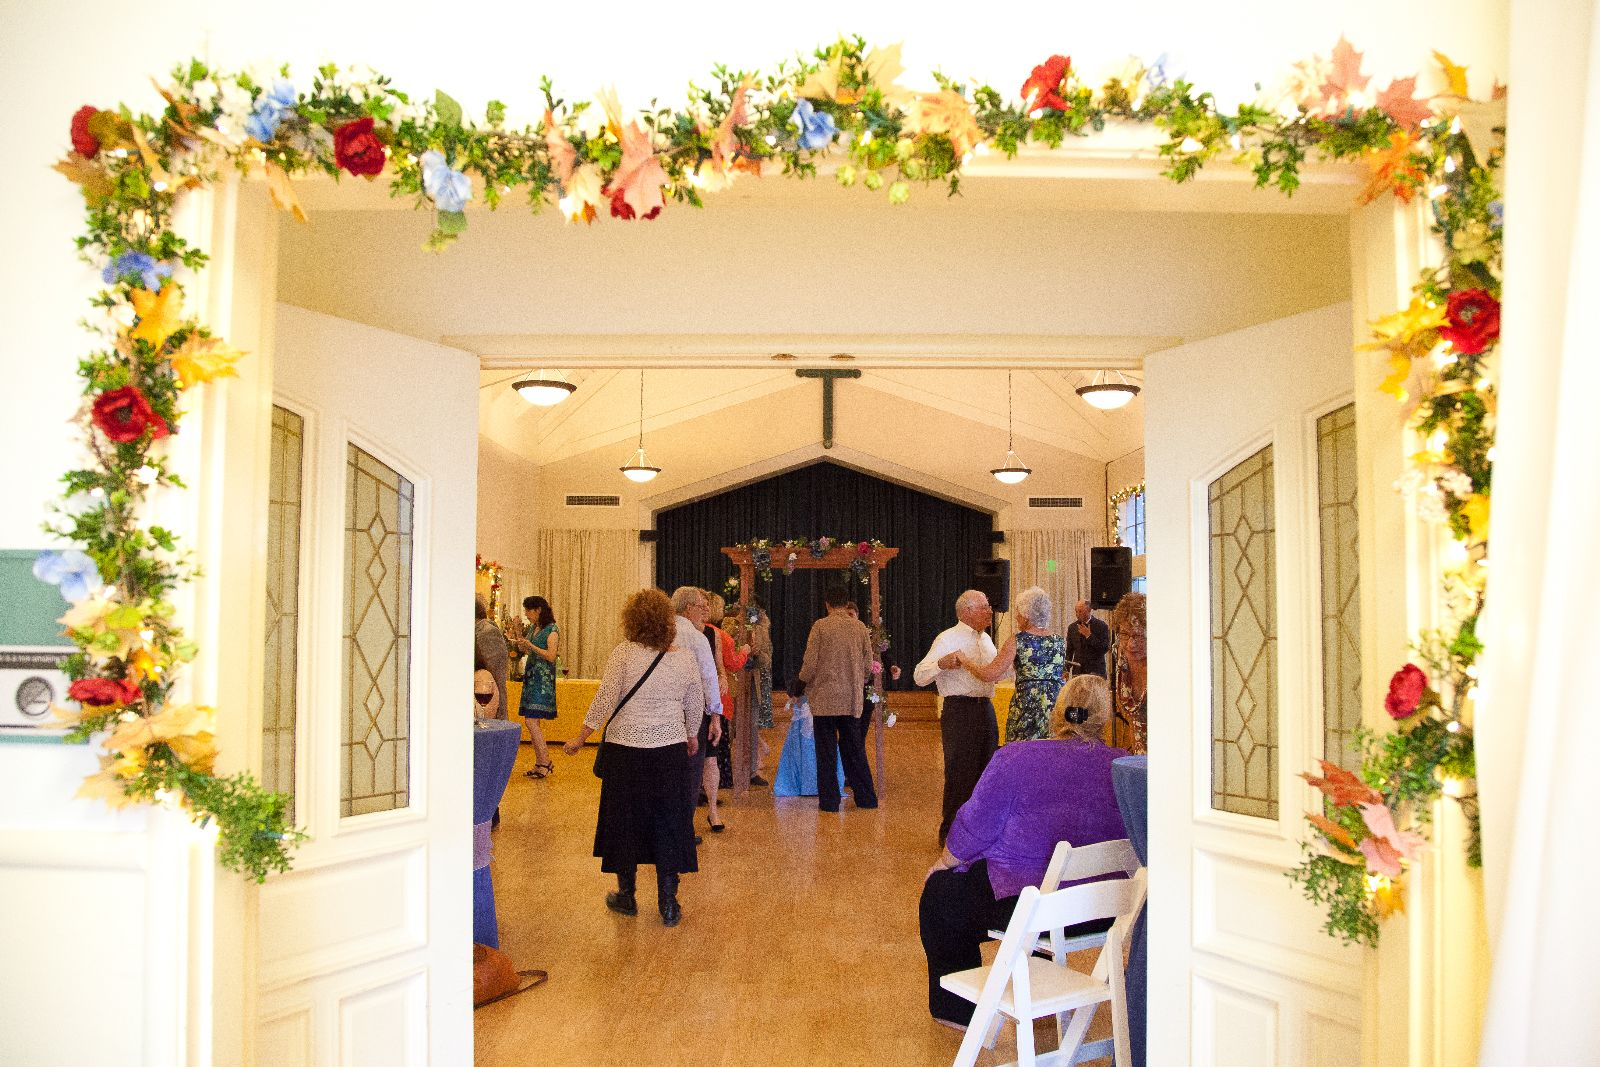 Weddings at Epiphany are festive affairs!